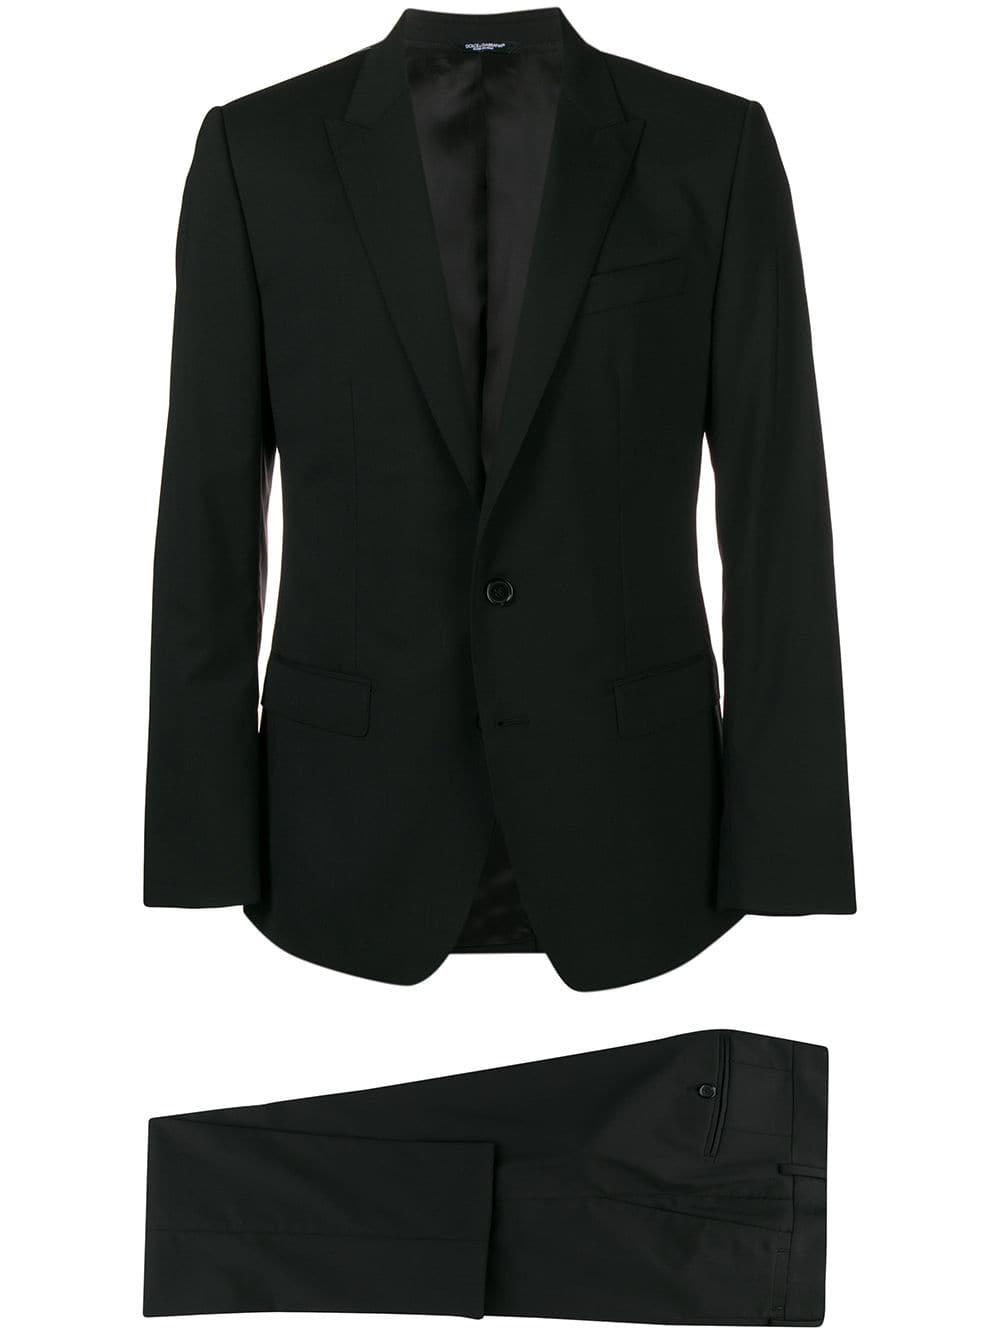 black virgin wool classic smoking suit DOLCE & GABBANA      GK0RMT-FUBECN0000